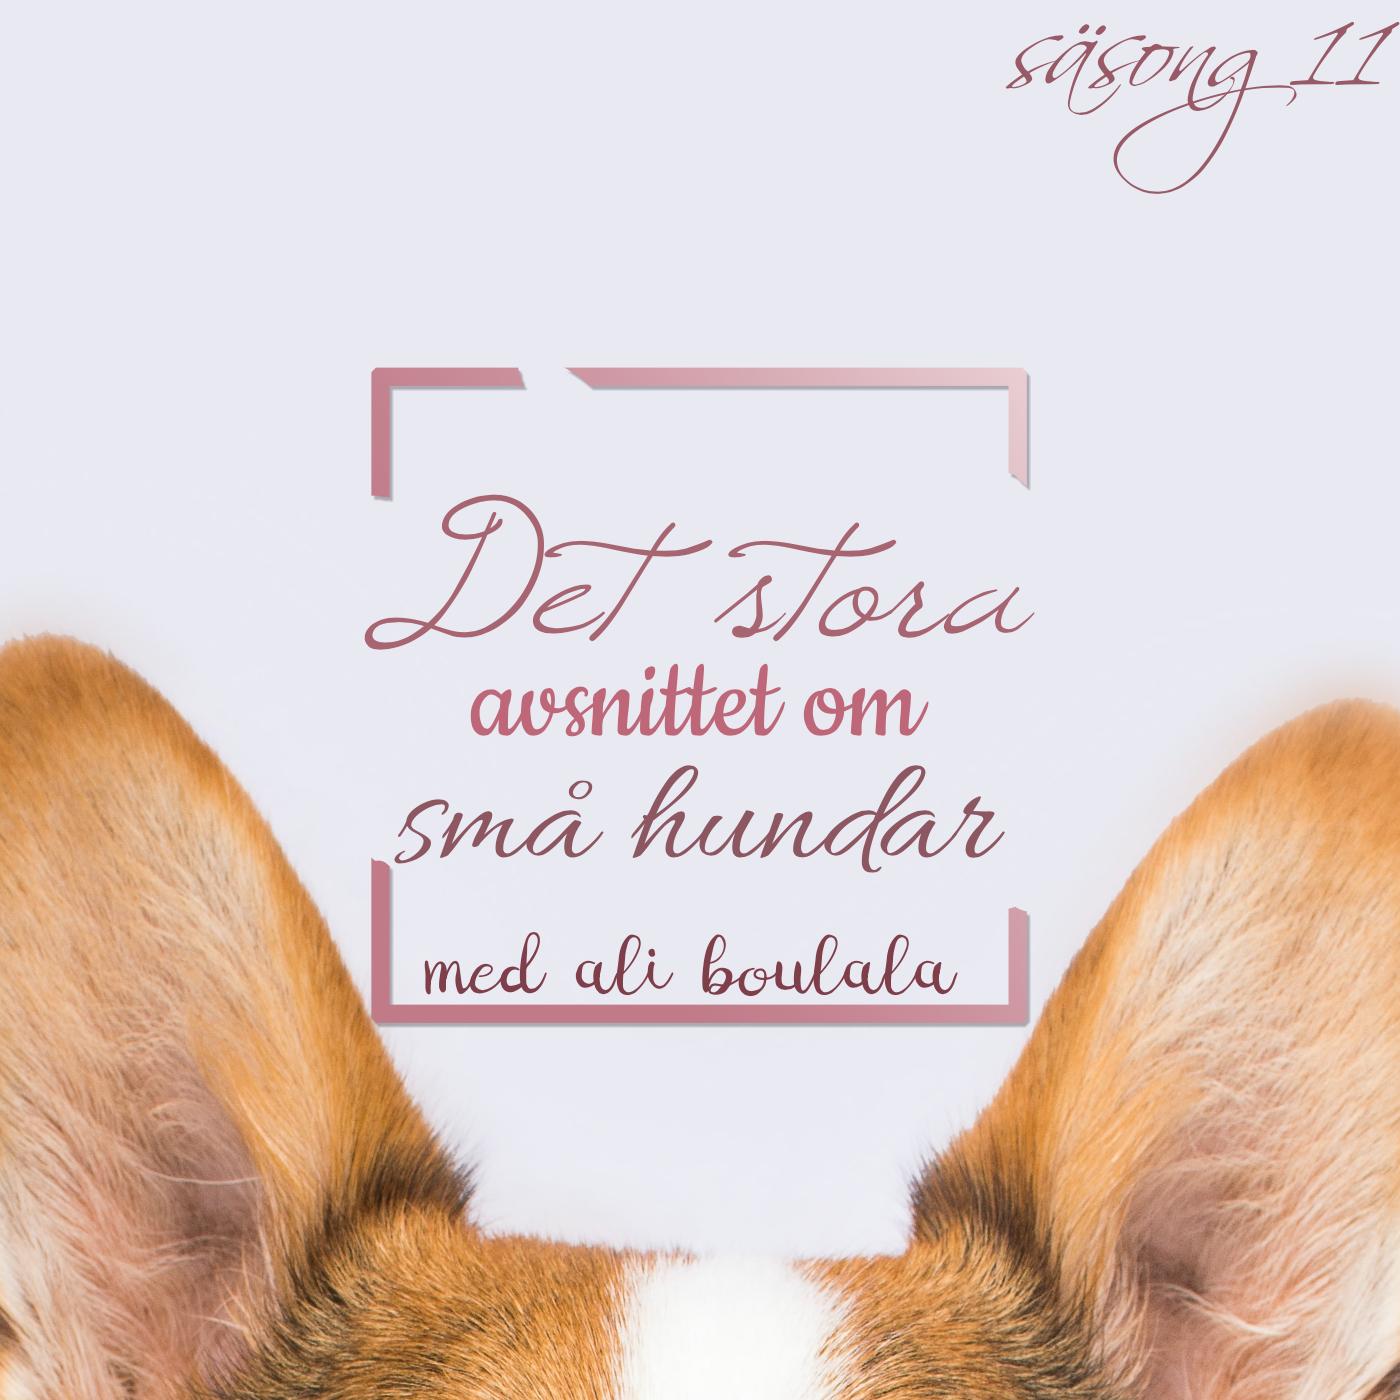 Det stora avsnittet om små hundar